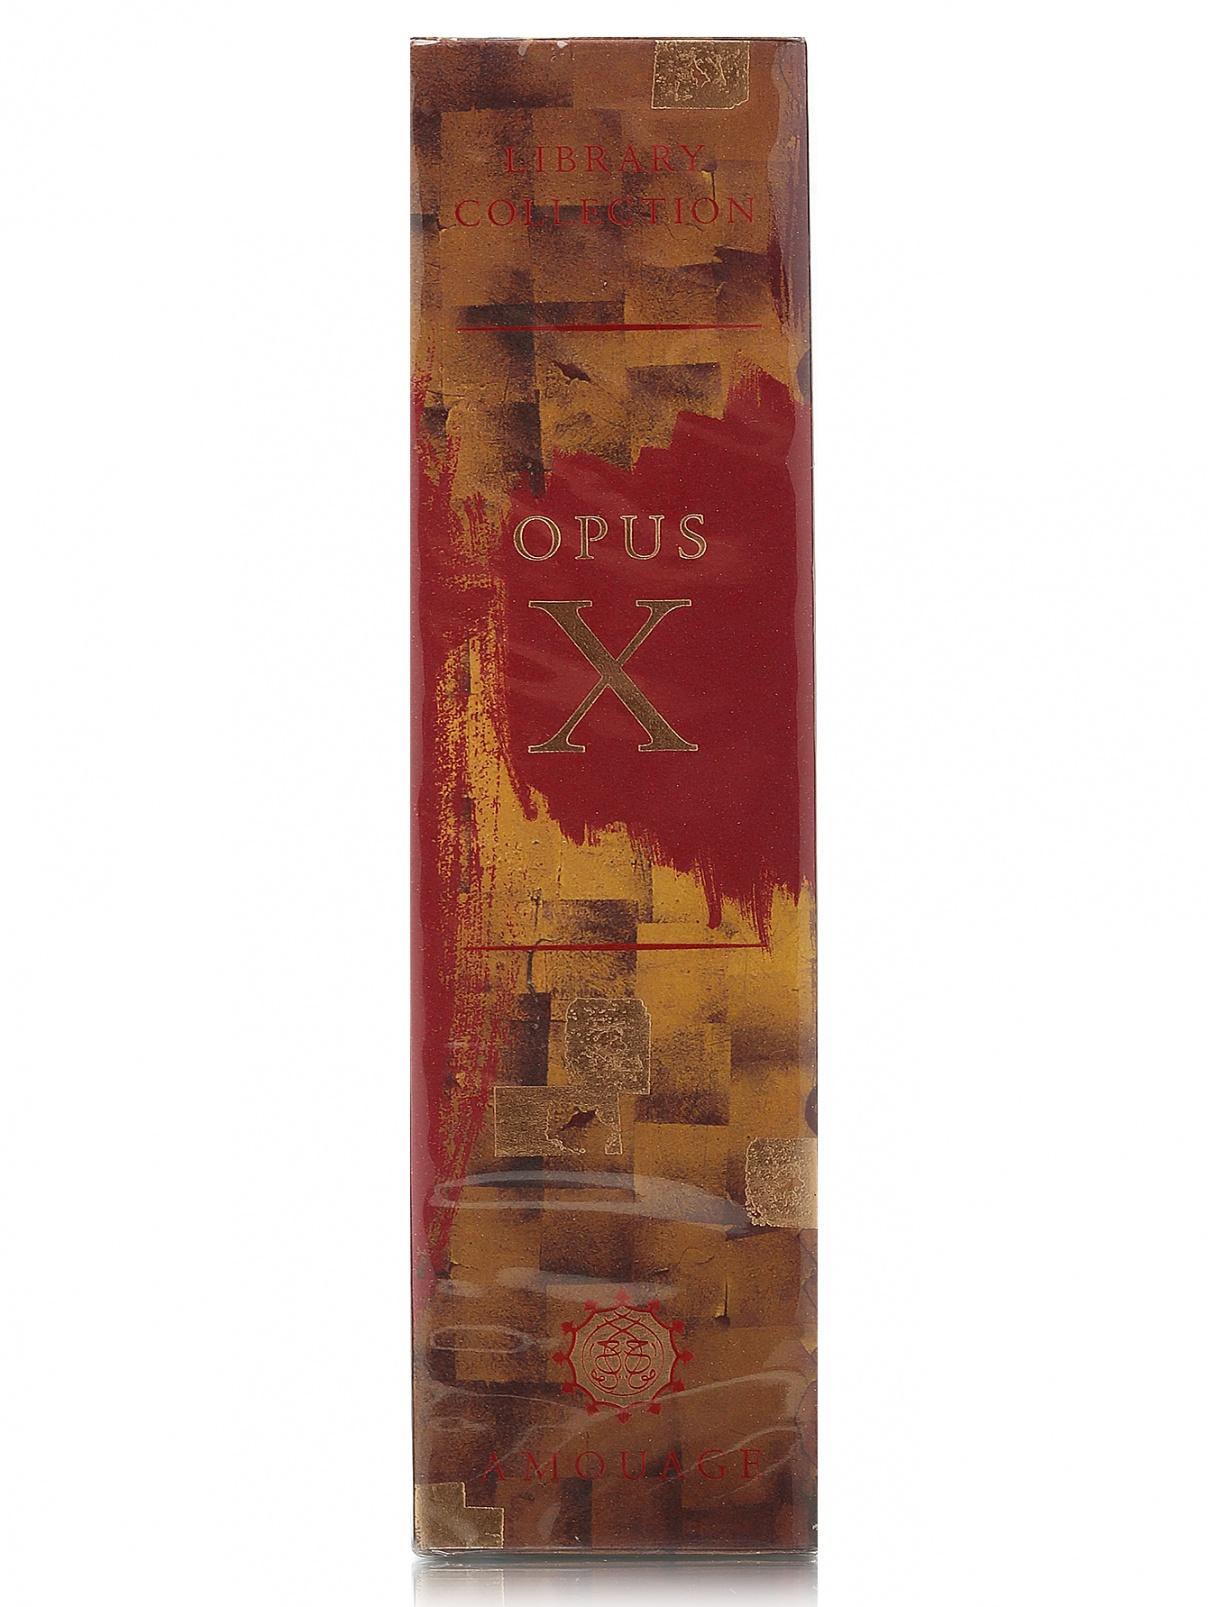 Парфюмерия - Opus x, Library Collection, 100ml Amouage  –  Модель Общий вид